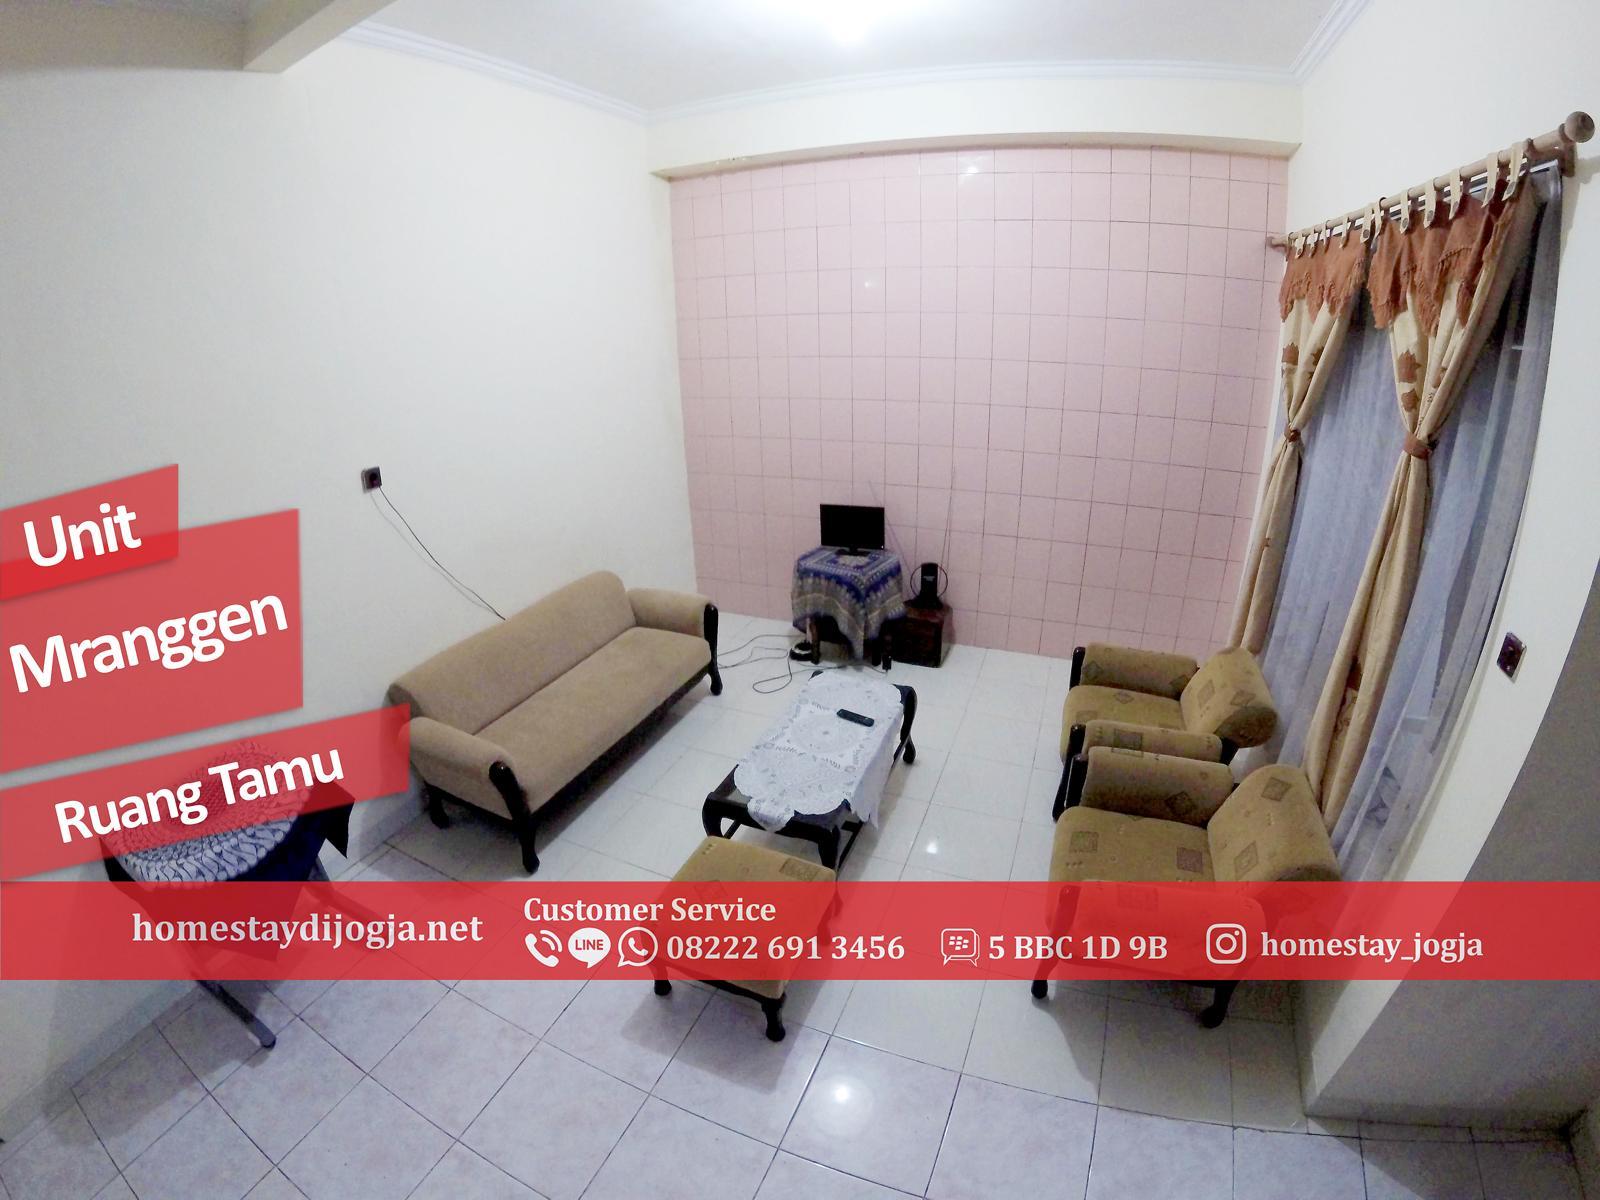 Guest House Jogja 3 kamar FAN di Mranggen 15 menit menuju malioboro